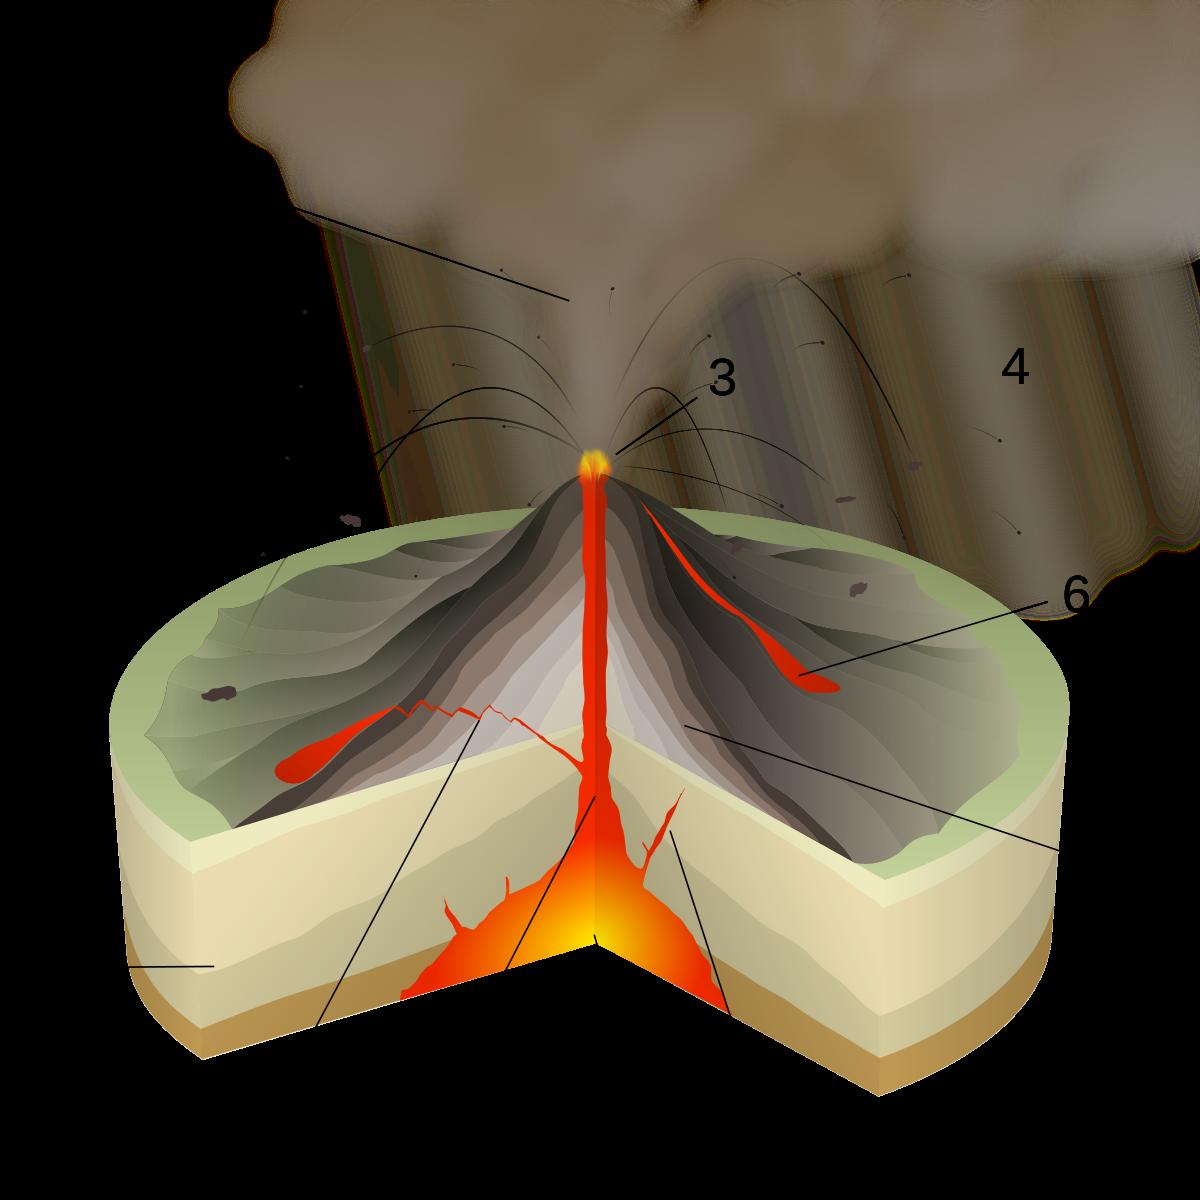 Vulcanian eruption wikipedia . Island clipart volcanic